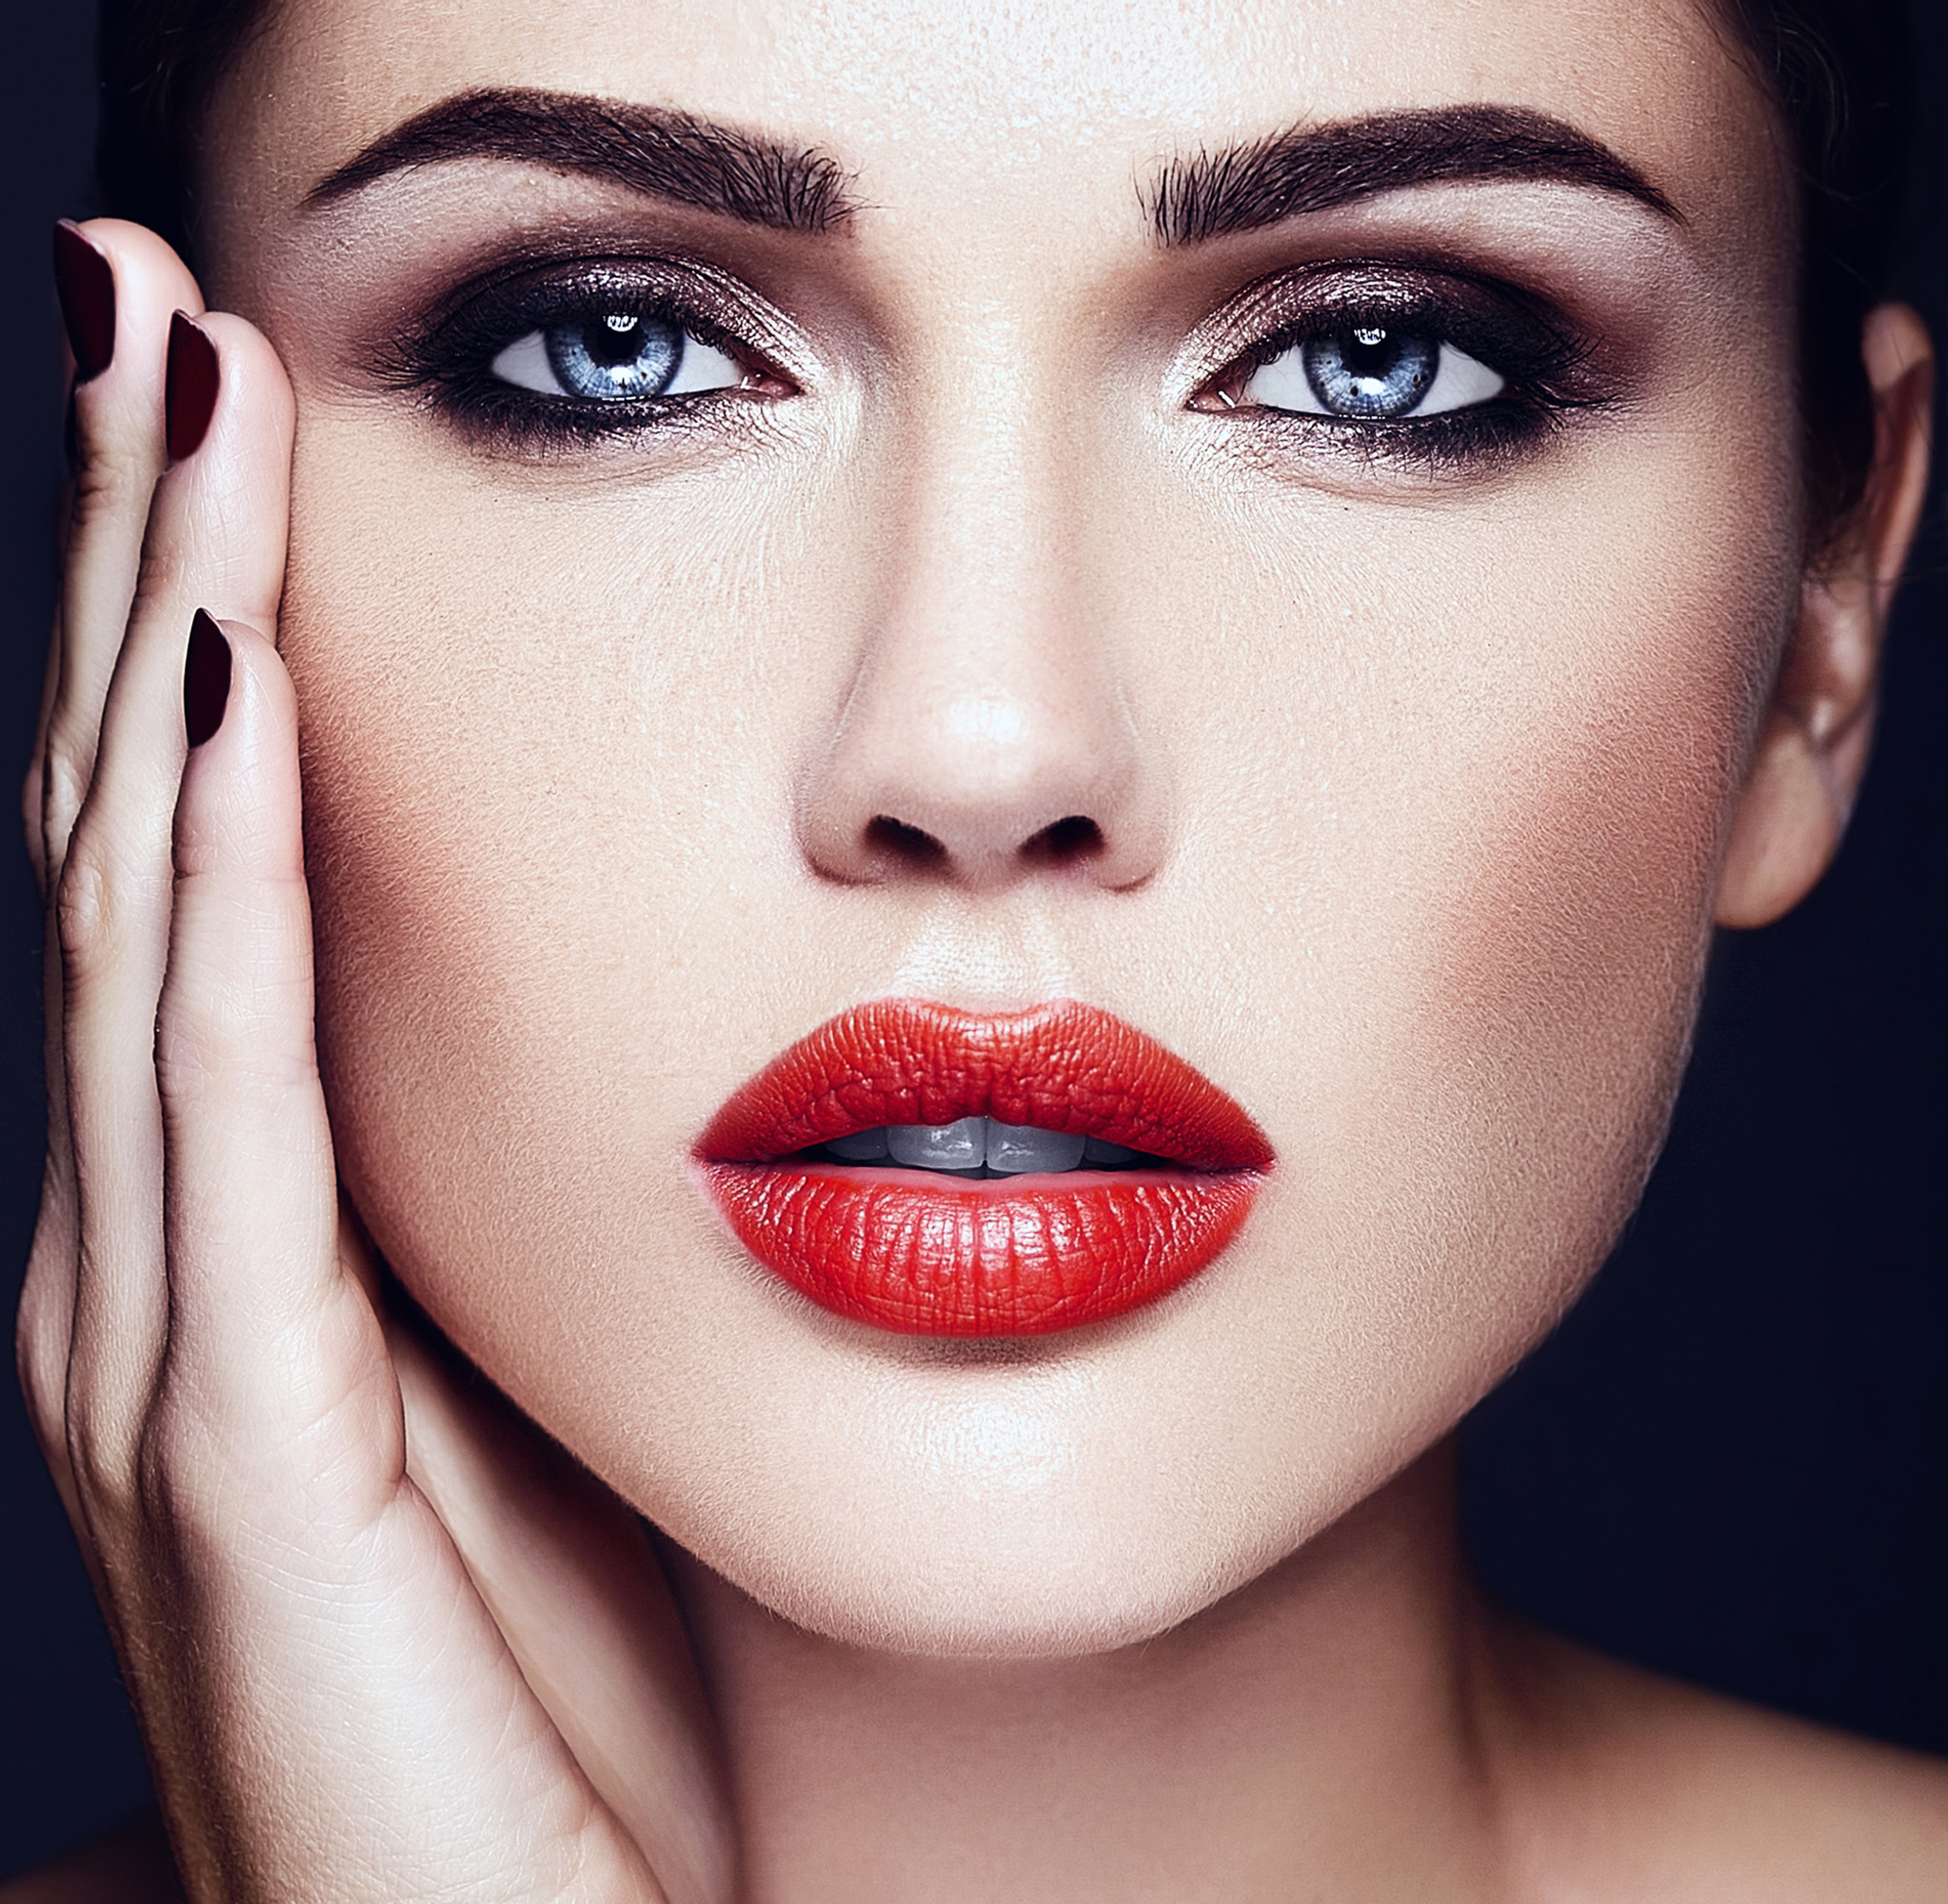 Consulta Medicina Estética Facial